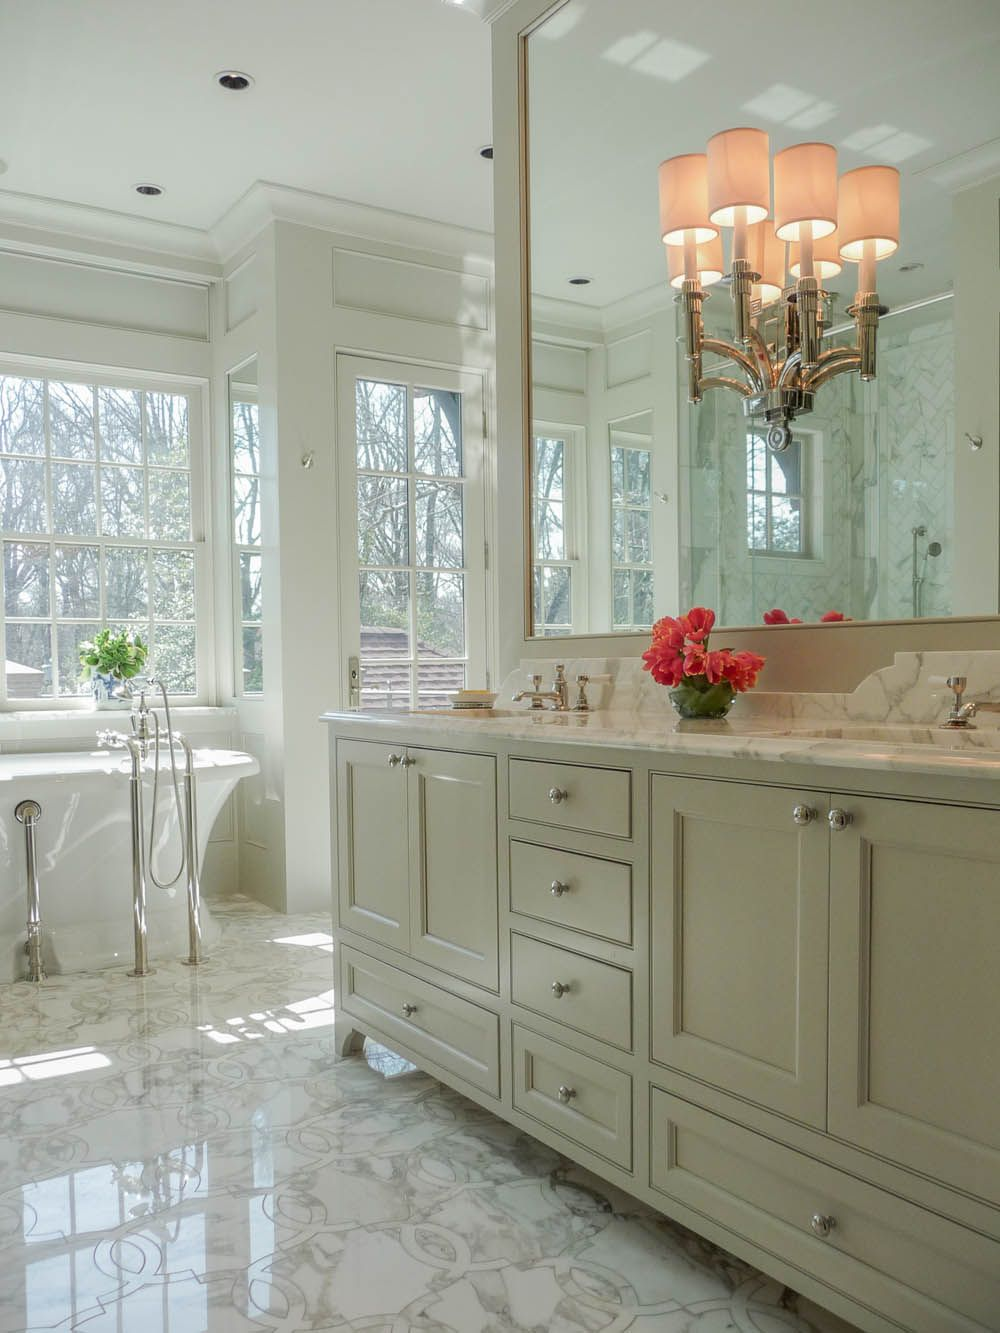 Waterworks fixtures, custom cabinetry, inlaid Marble floors & tub ...